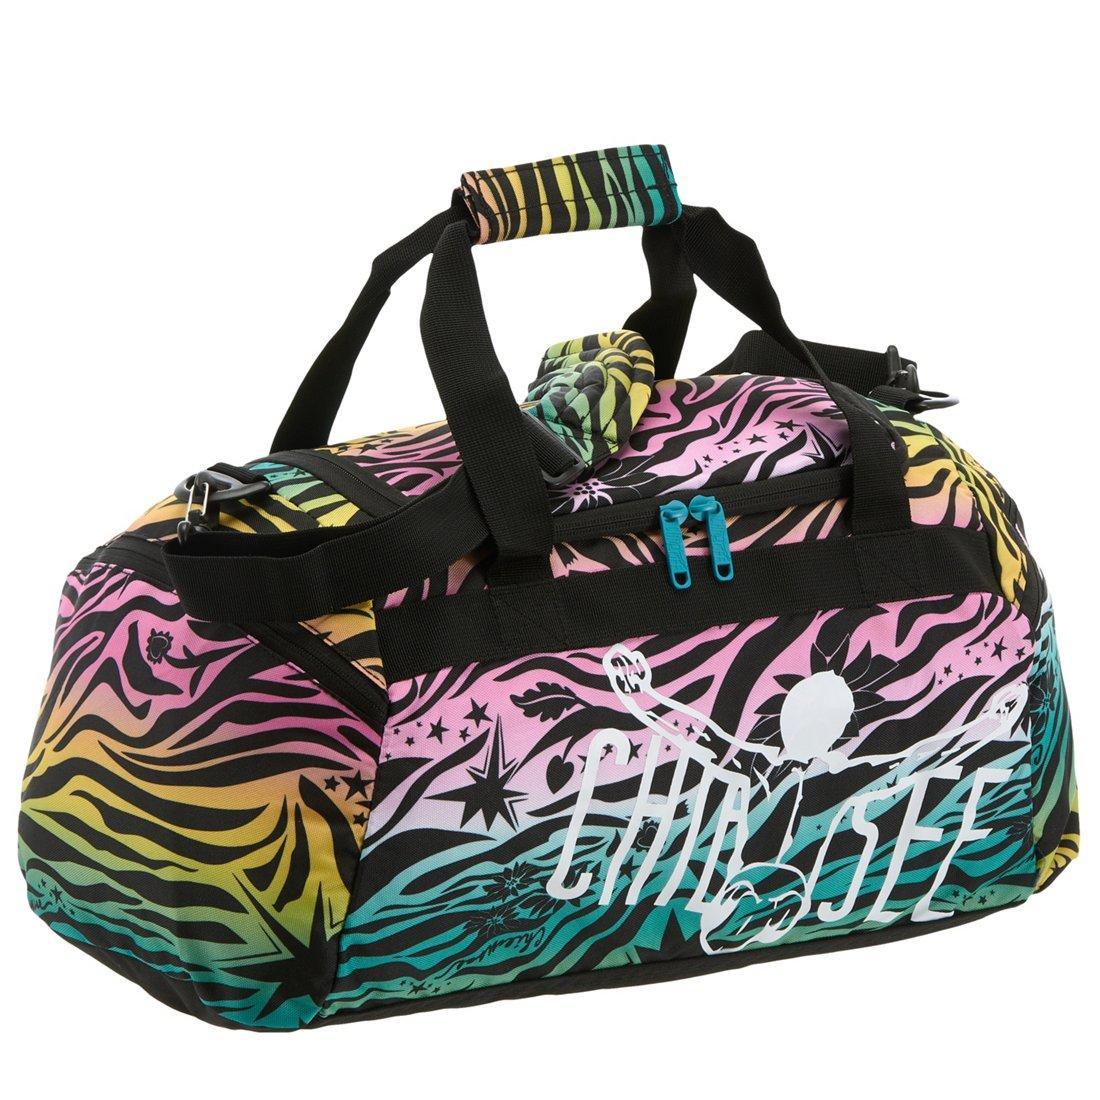 db450a9efbbc1 Chiemsee Sports   Travel Bags Small Matchbag 50 cm - koffer-direkt.de